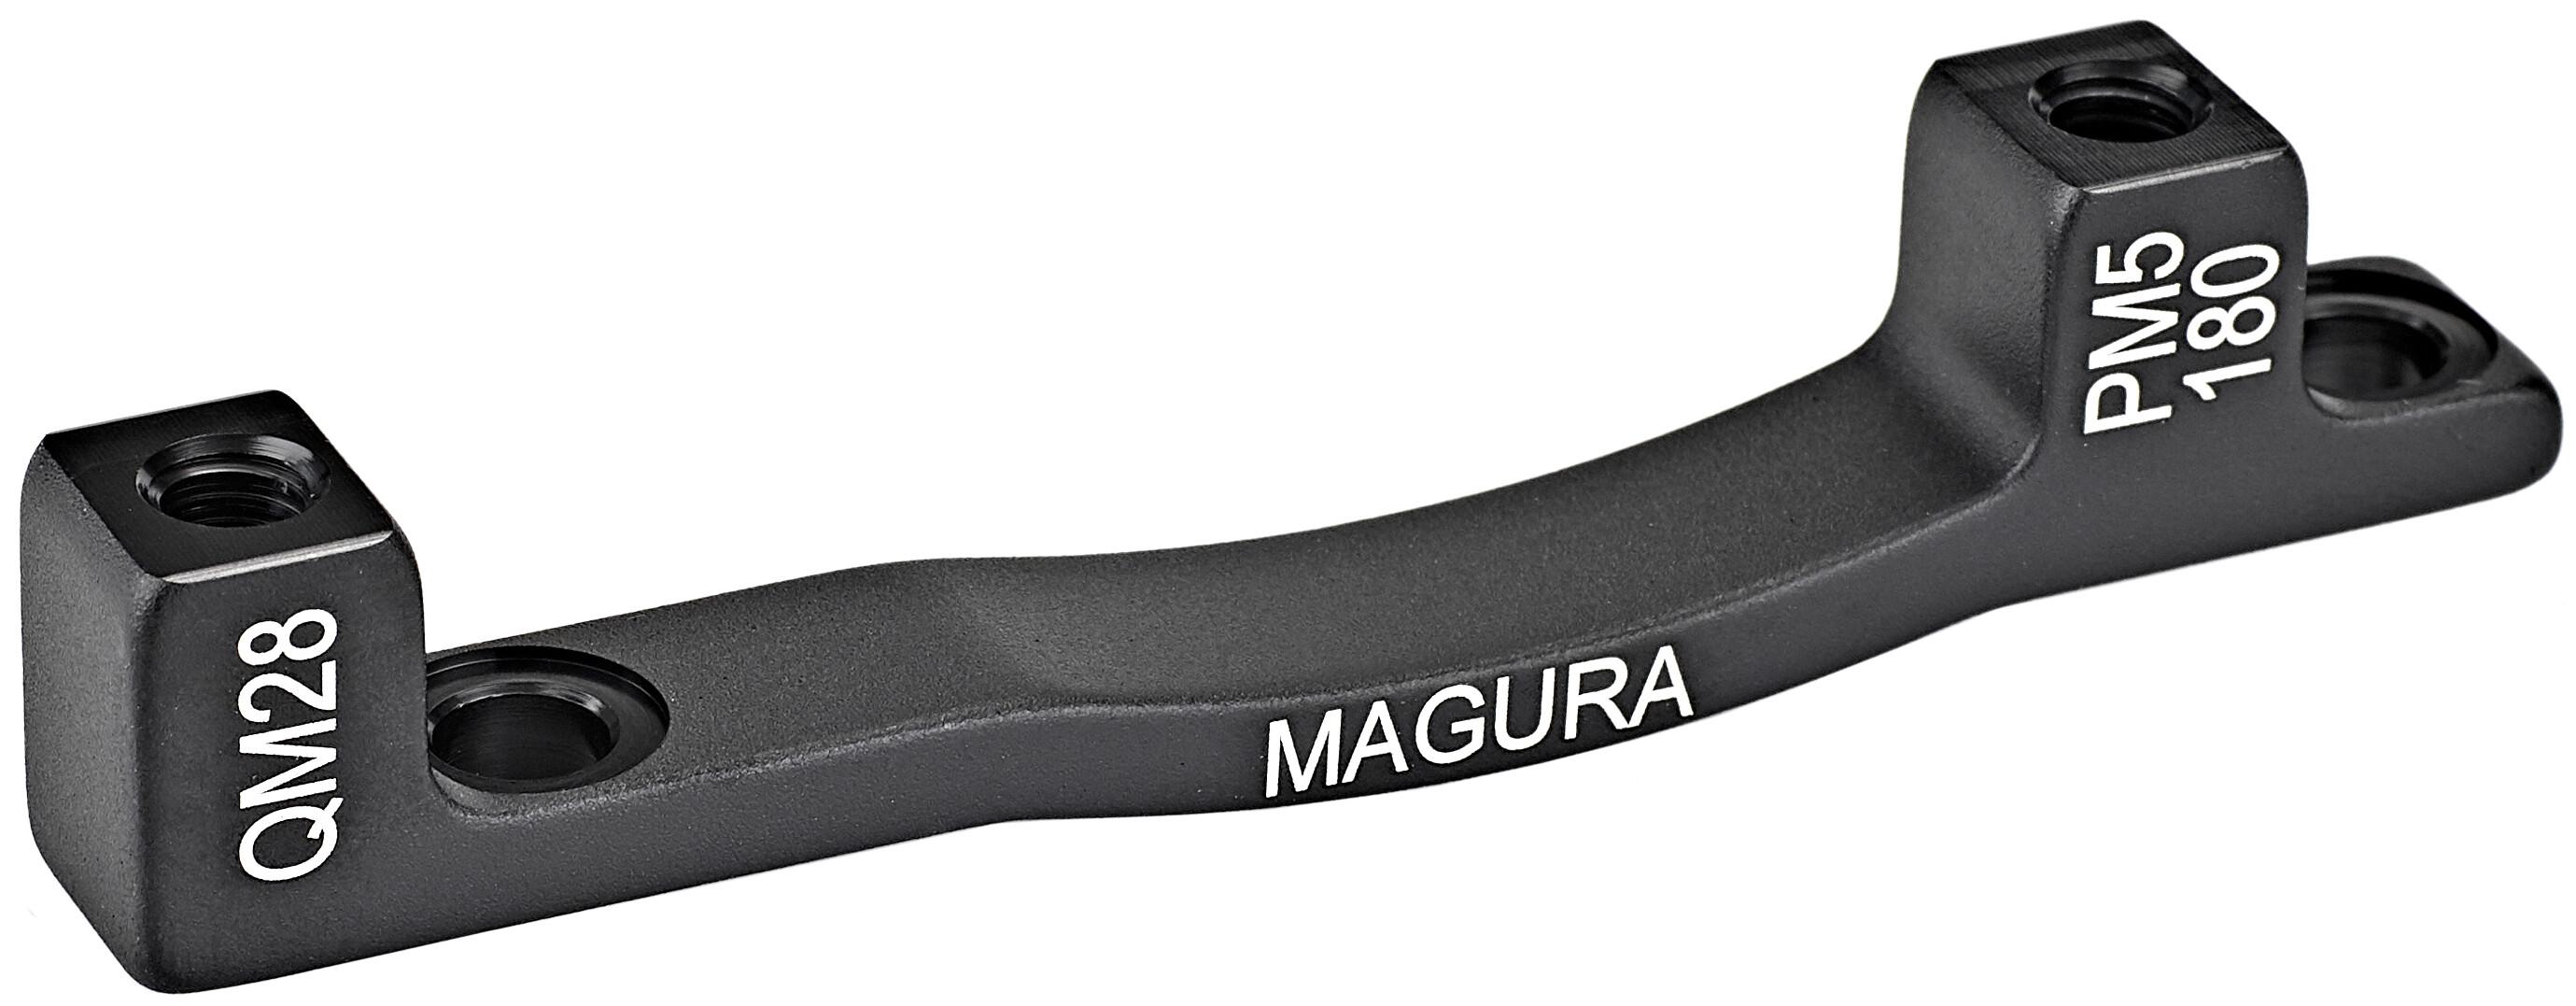 Adaptador para Disco de Freno Magura Adapter QM 44 PM 180-203 mm Black